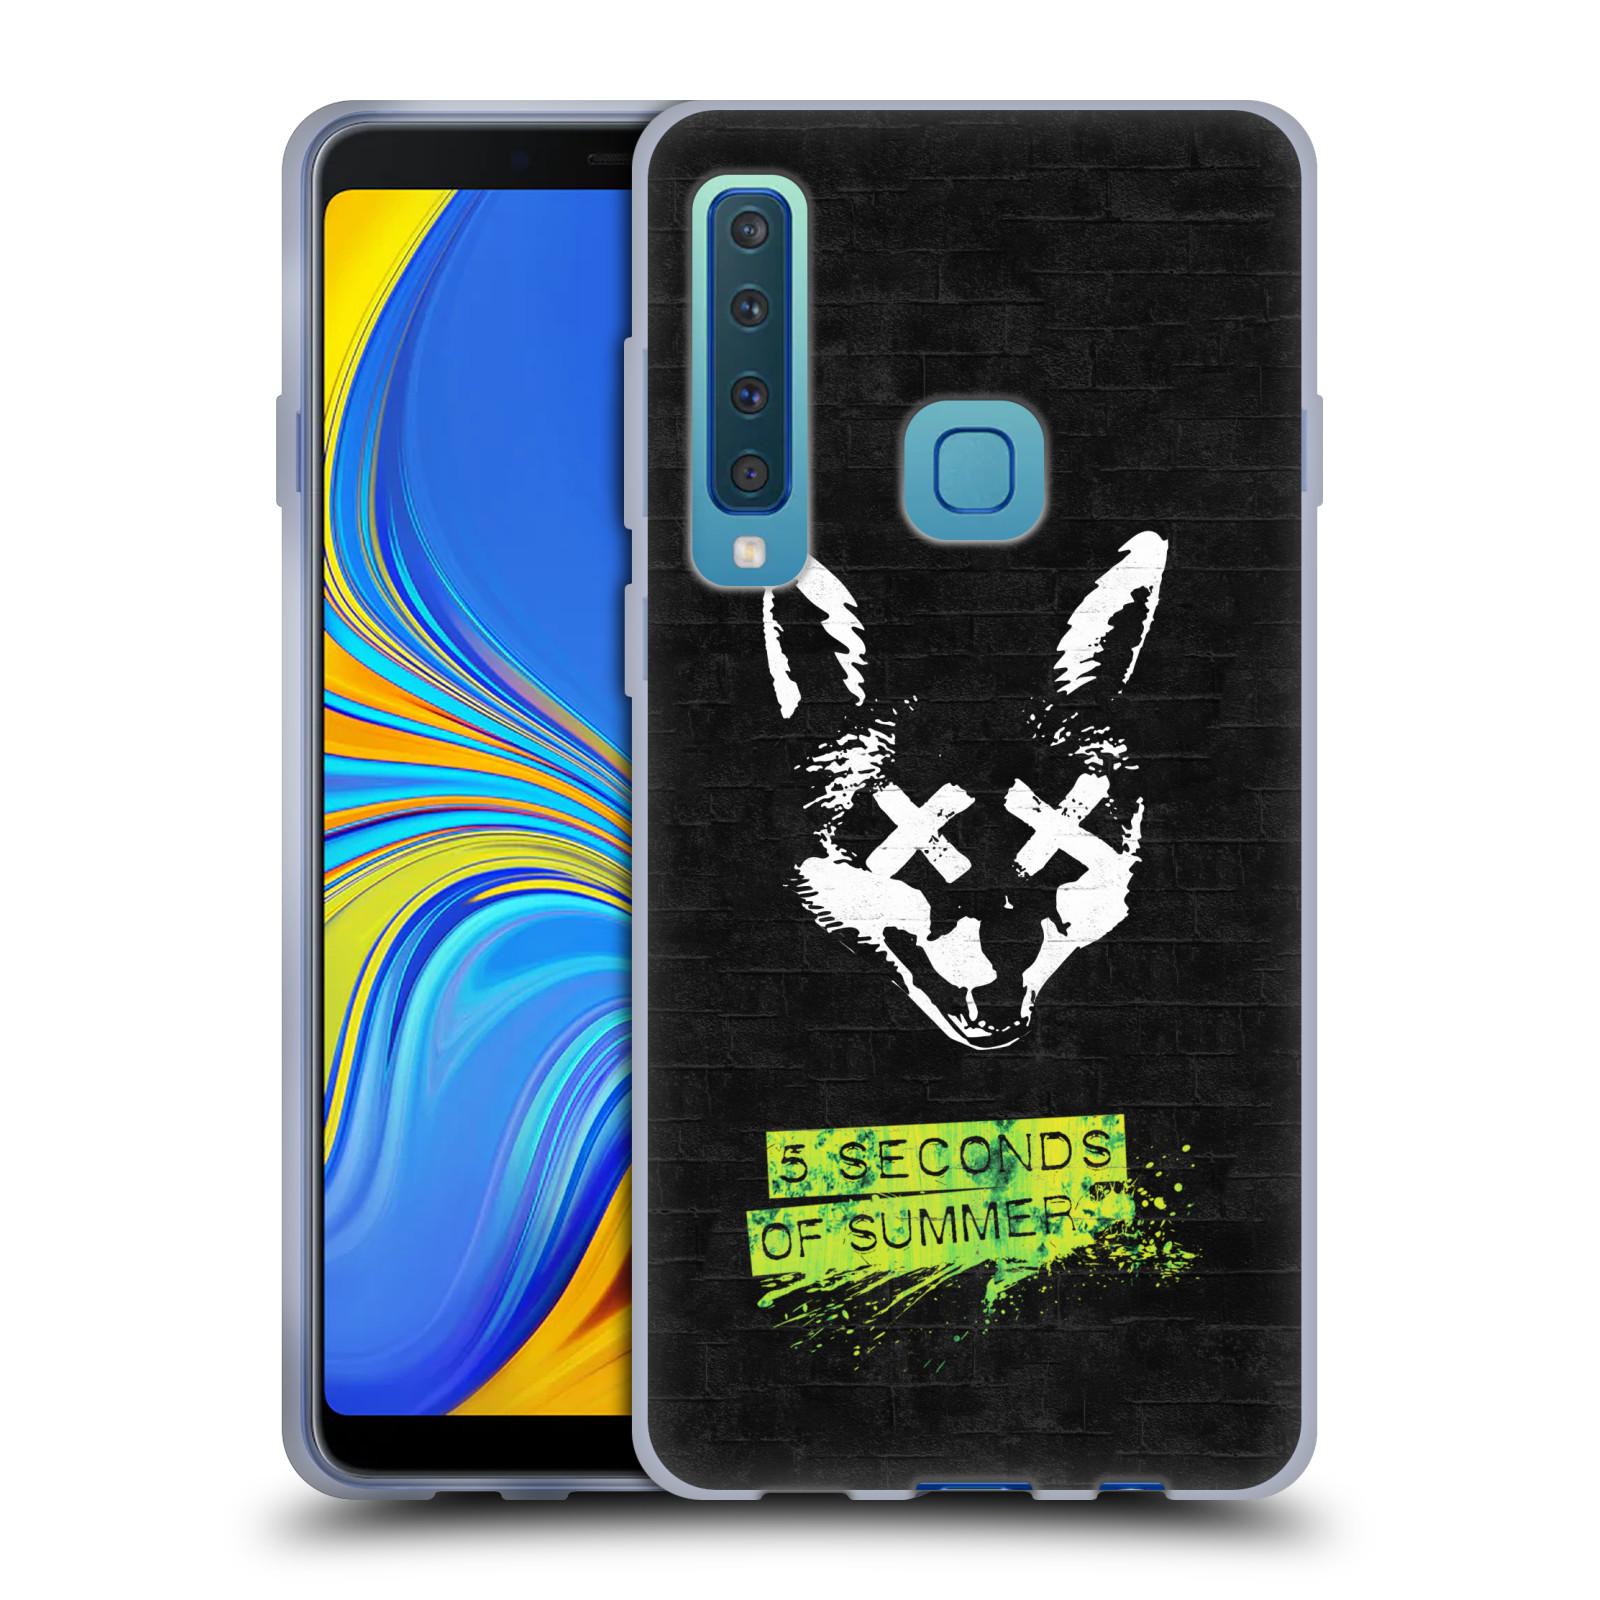 Silikonové pouzdro na mobil Samsung Galaxy A9 (2018) - Head Case - 5 Seconds of Summer - Fox